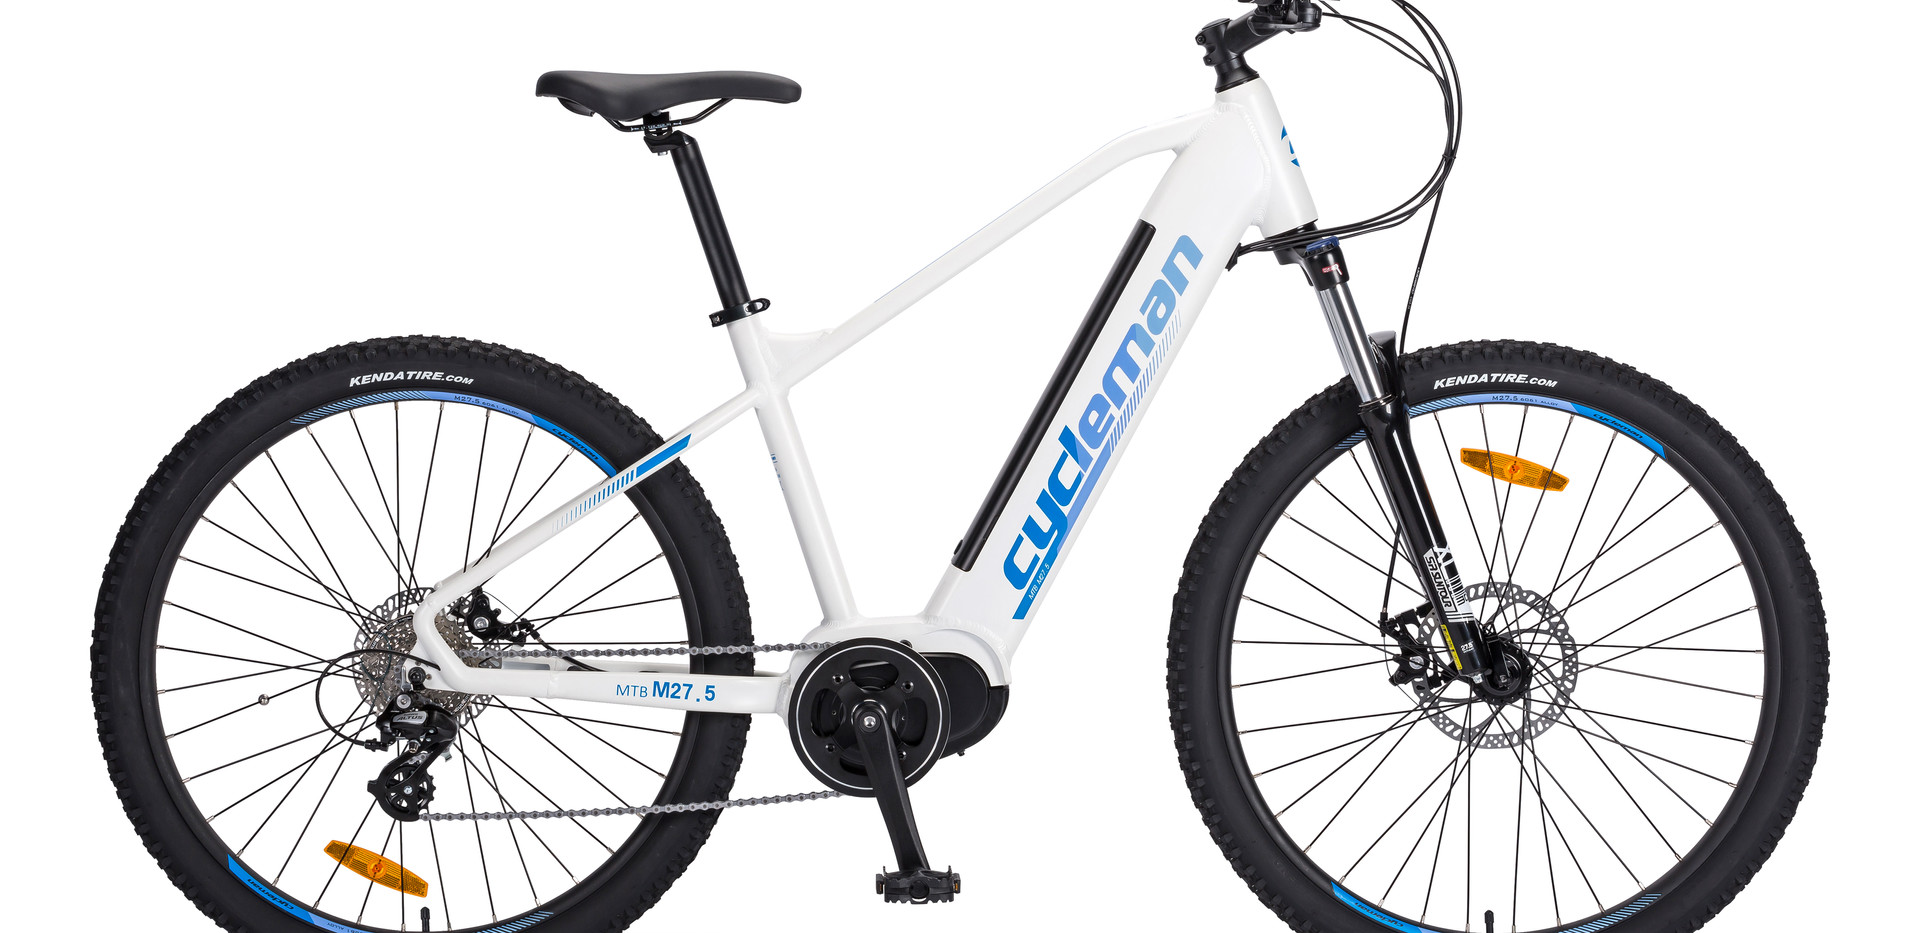 Visiobike Cycleman 27.5 M560